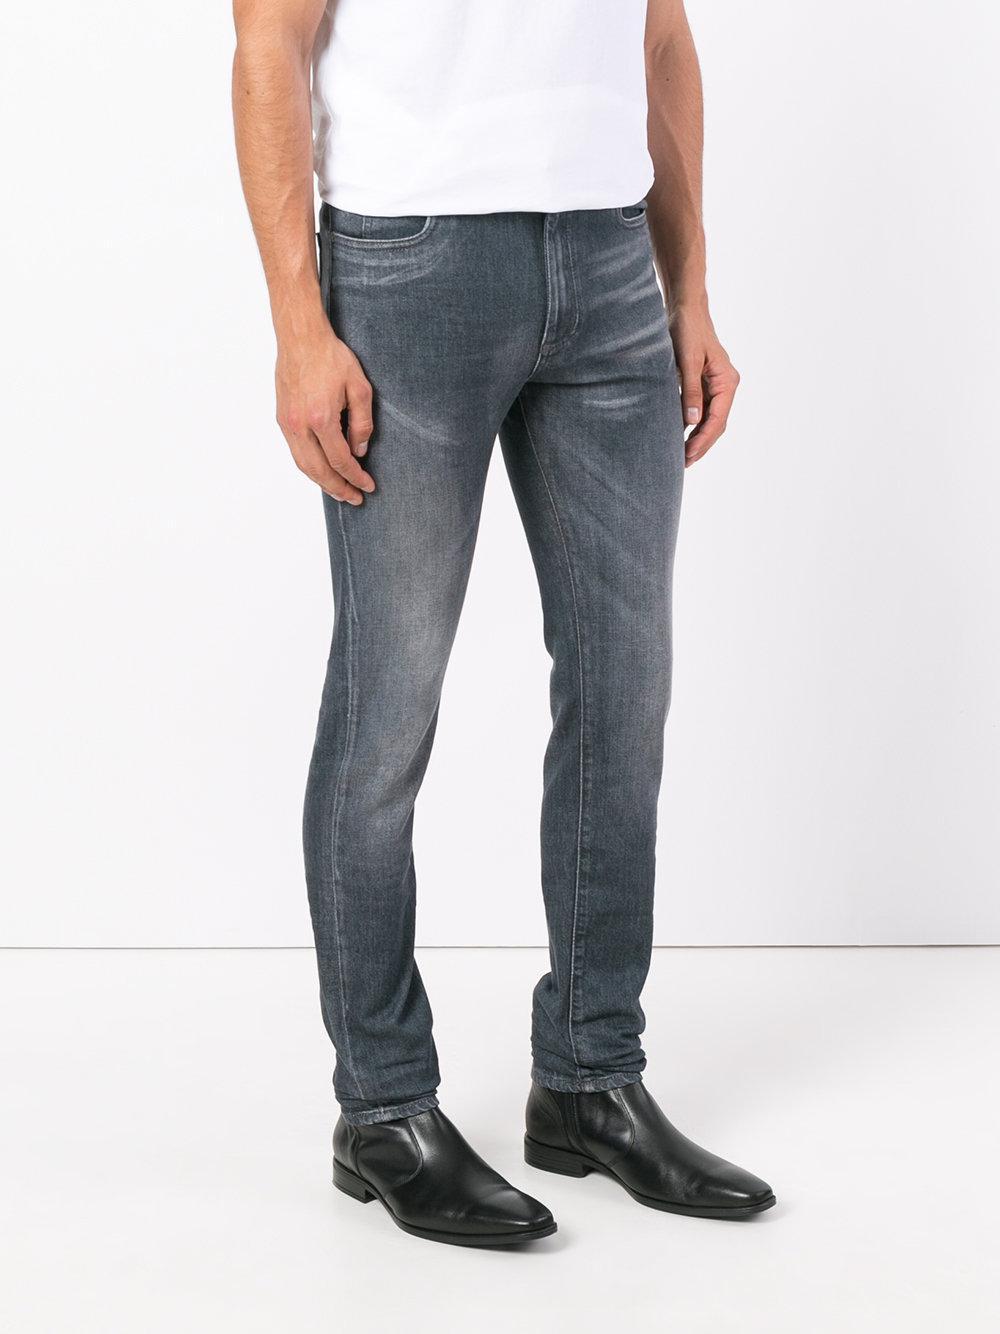 Maison Margiela Denim Slim-fit Jeans in Grey (Grey) for Men